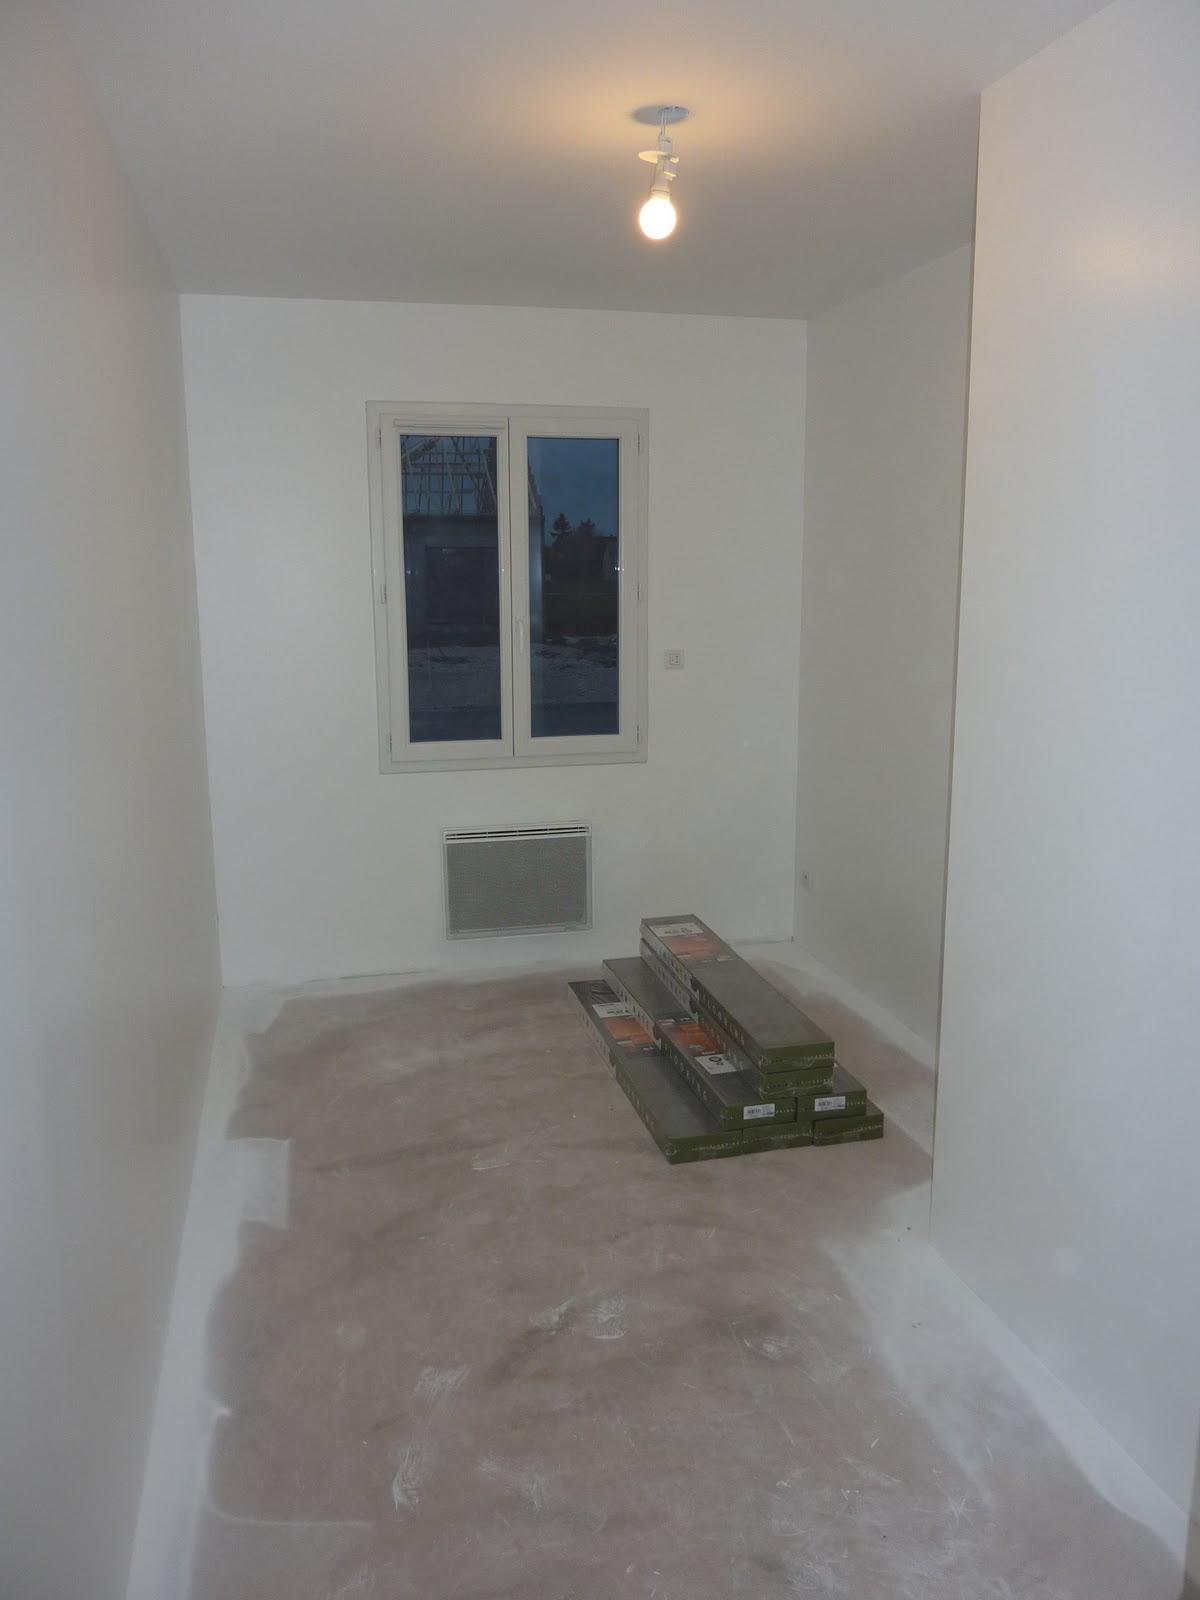 la construction de lac peinture des chambres. Black Bedroom Furniture Sets. Home Design Ideas